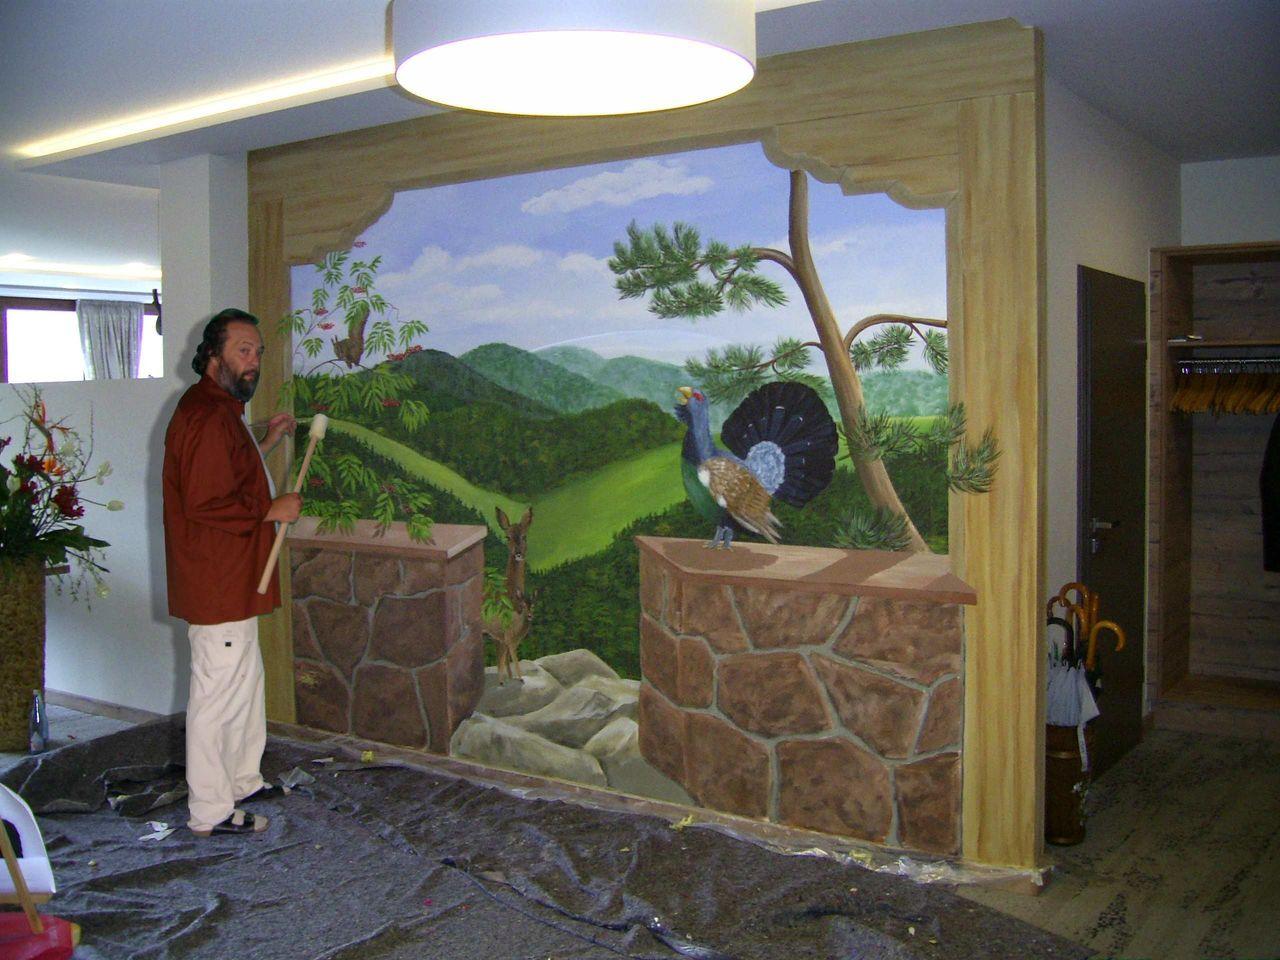 bild wandmalerei illusionsmalerei schwarzwaldlandschaft. Black Bedroom Furniture Sets. Home Design Ideas